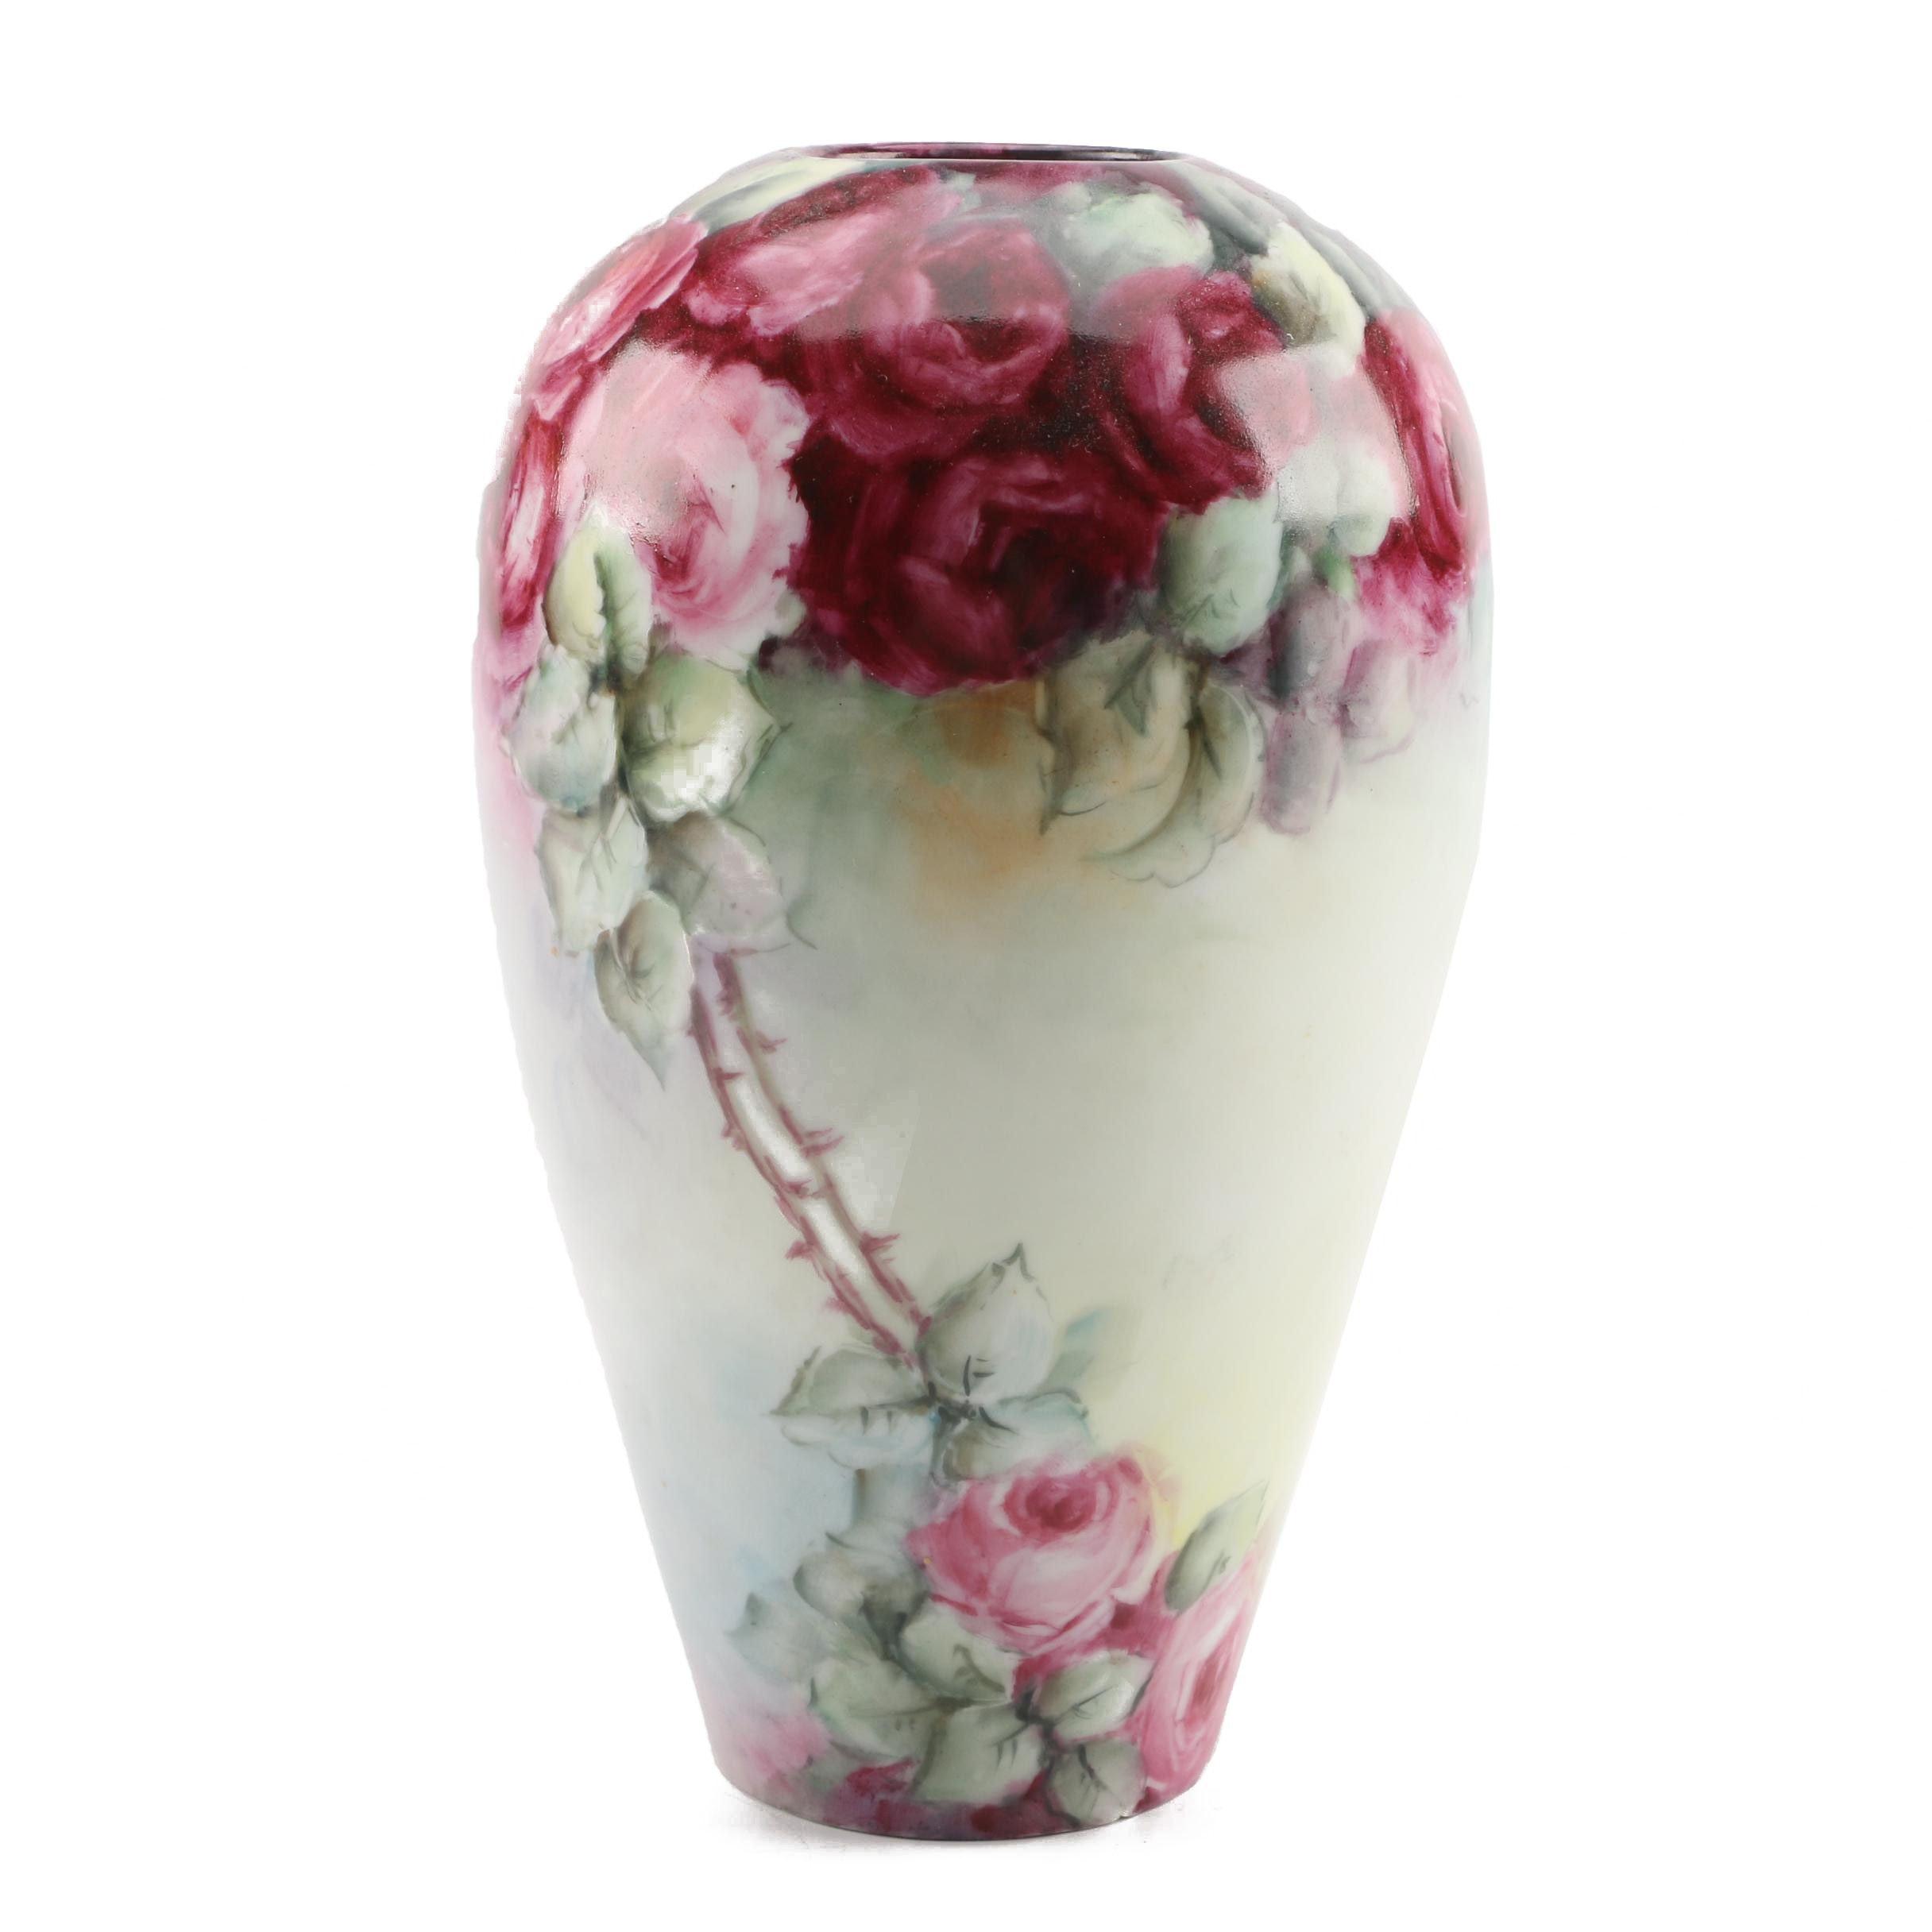 Hand-Painted Porcelain Floral Vase